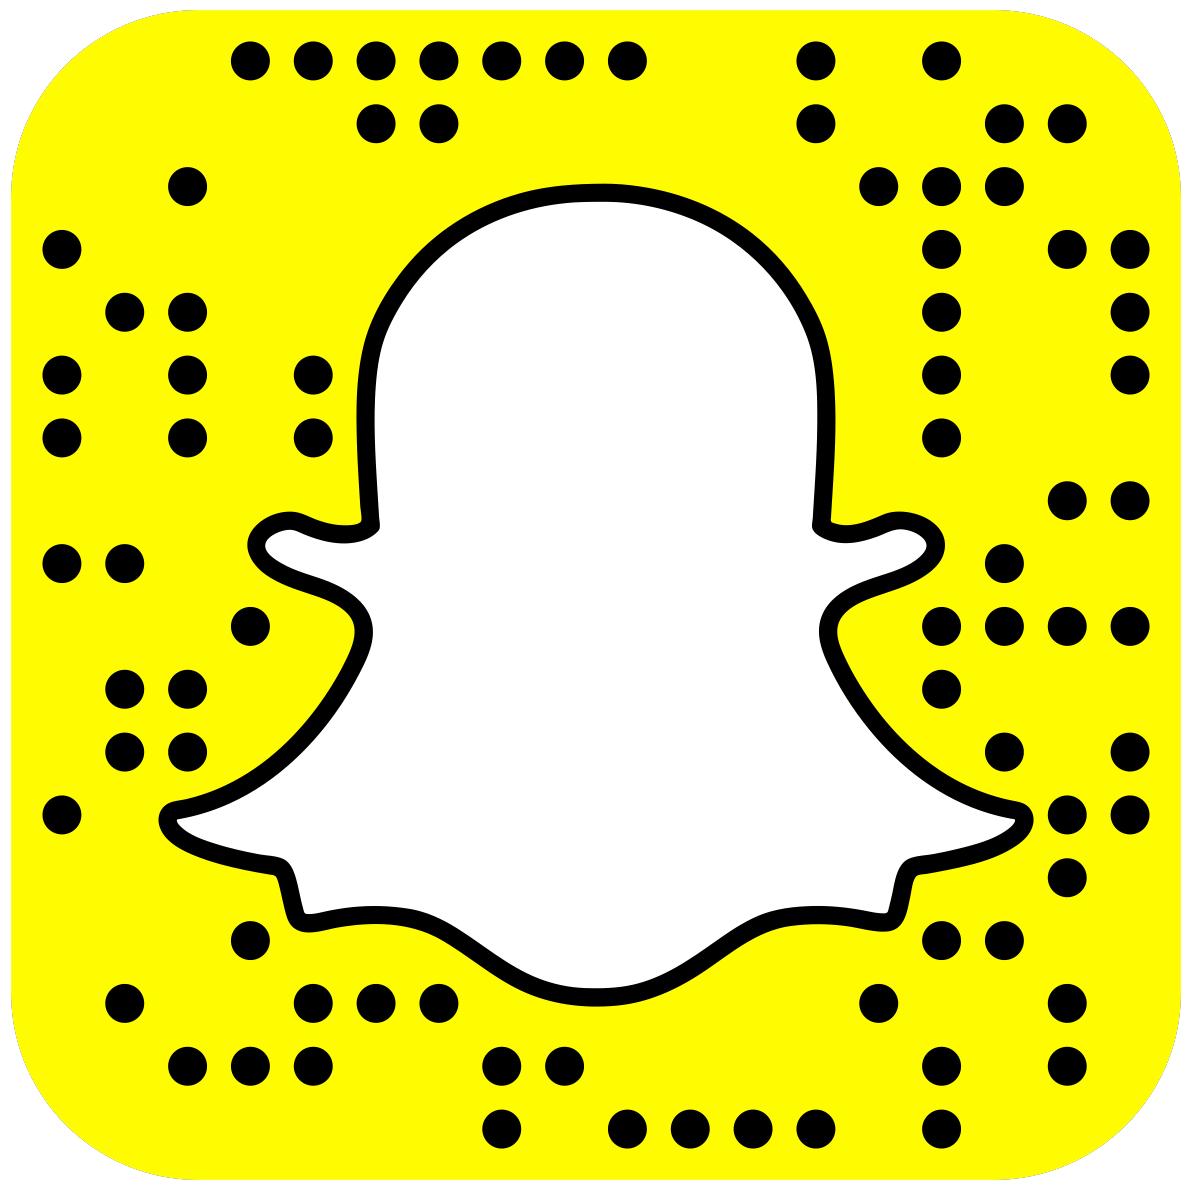 Chelsea Houska Snapchat username